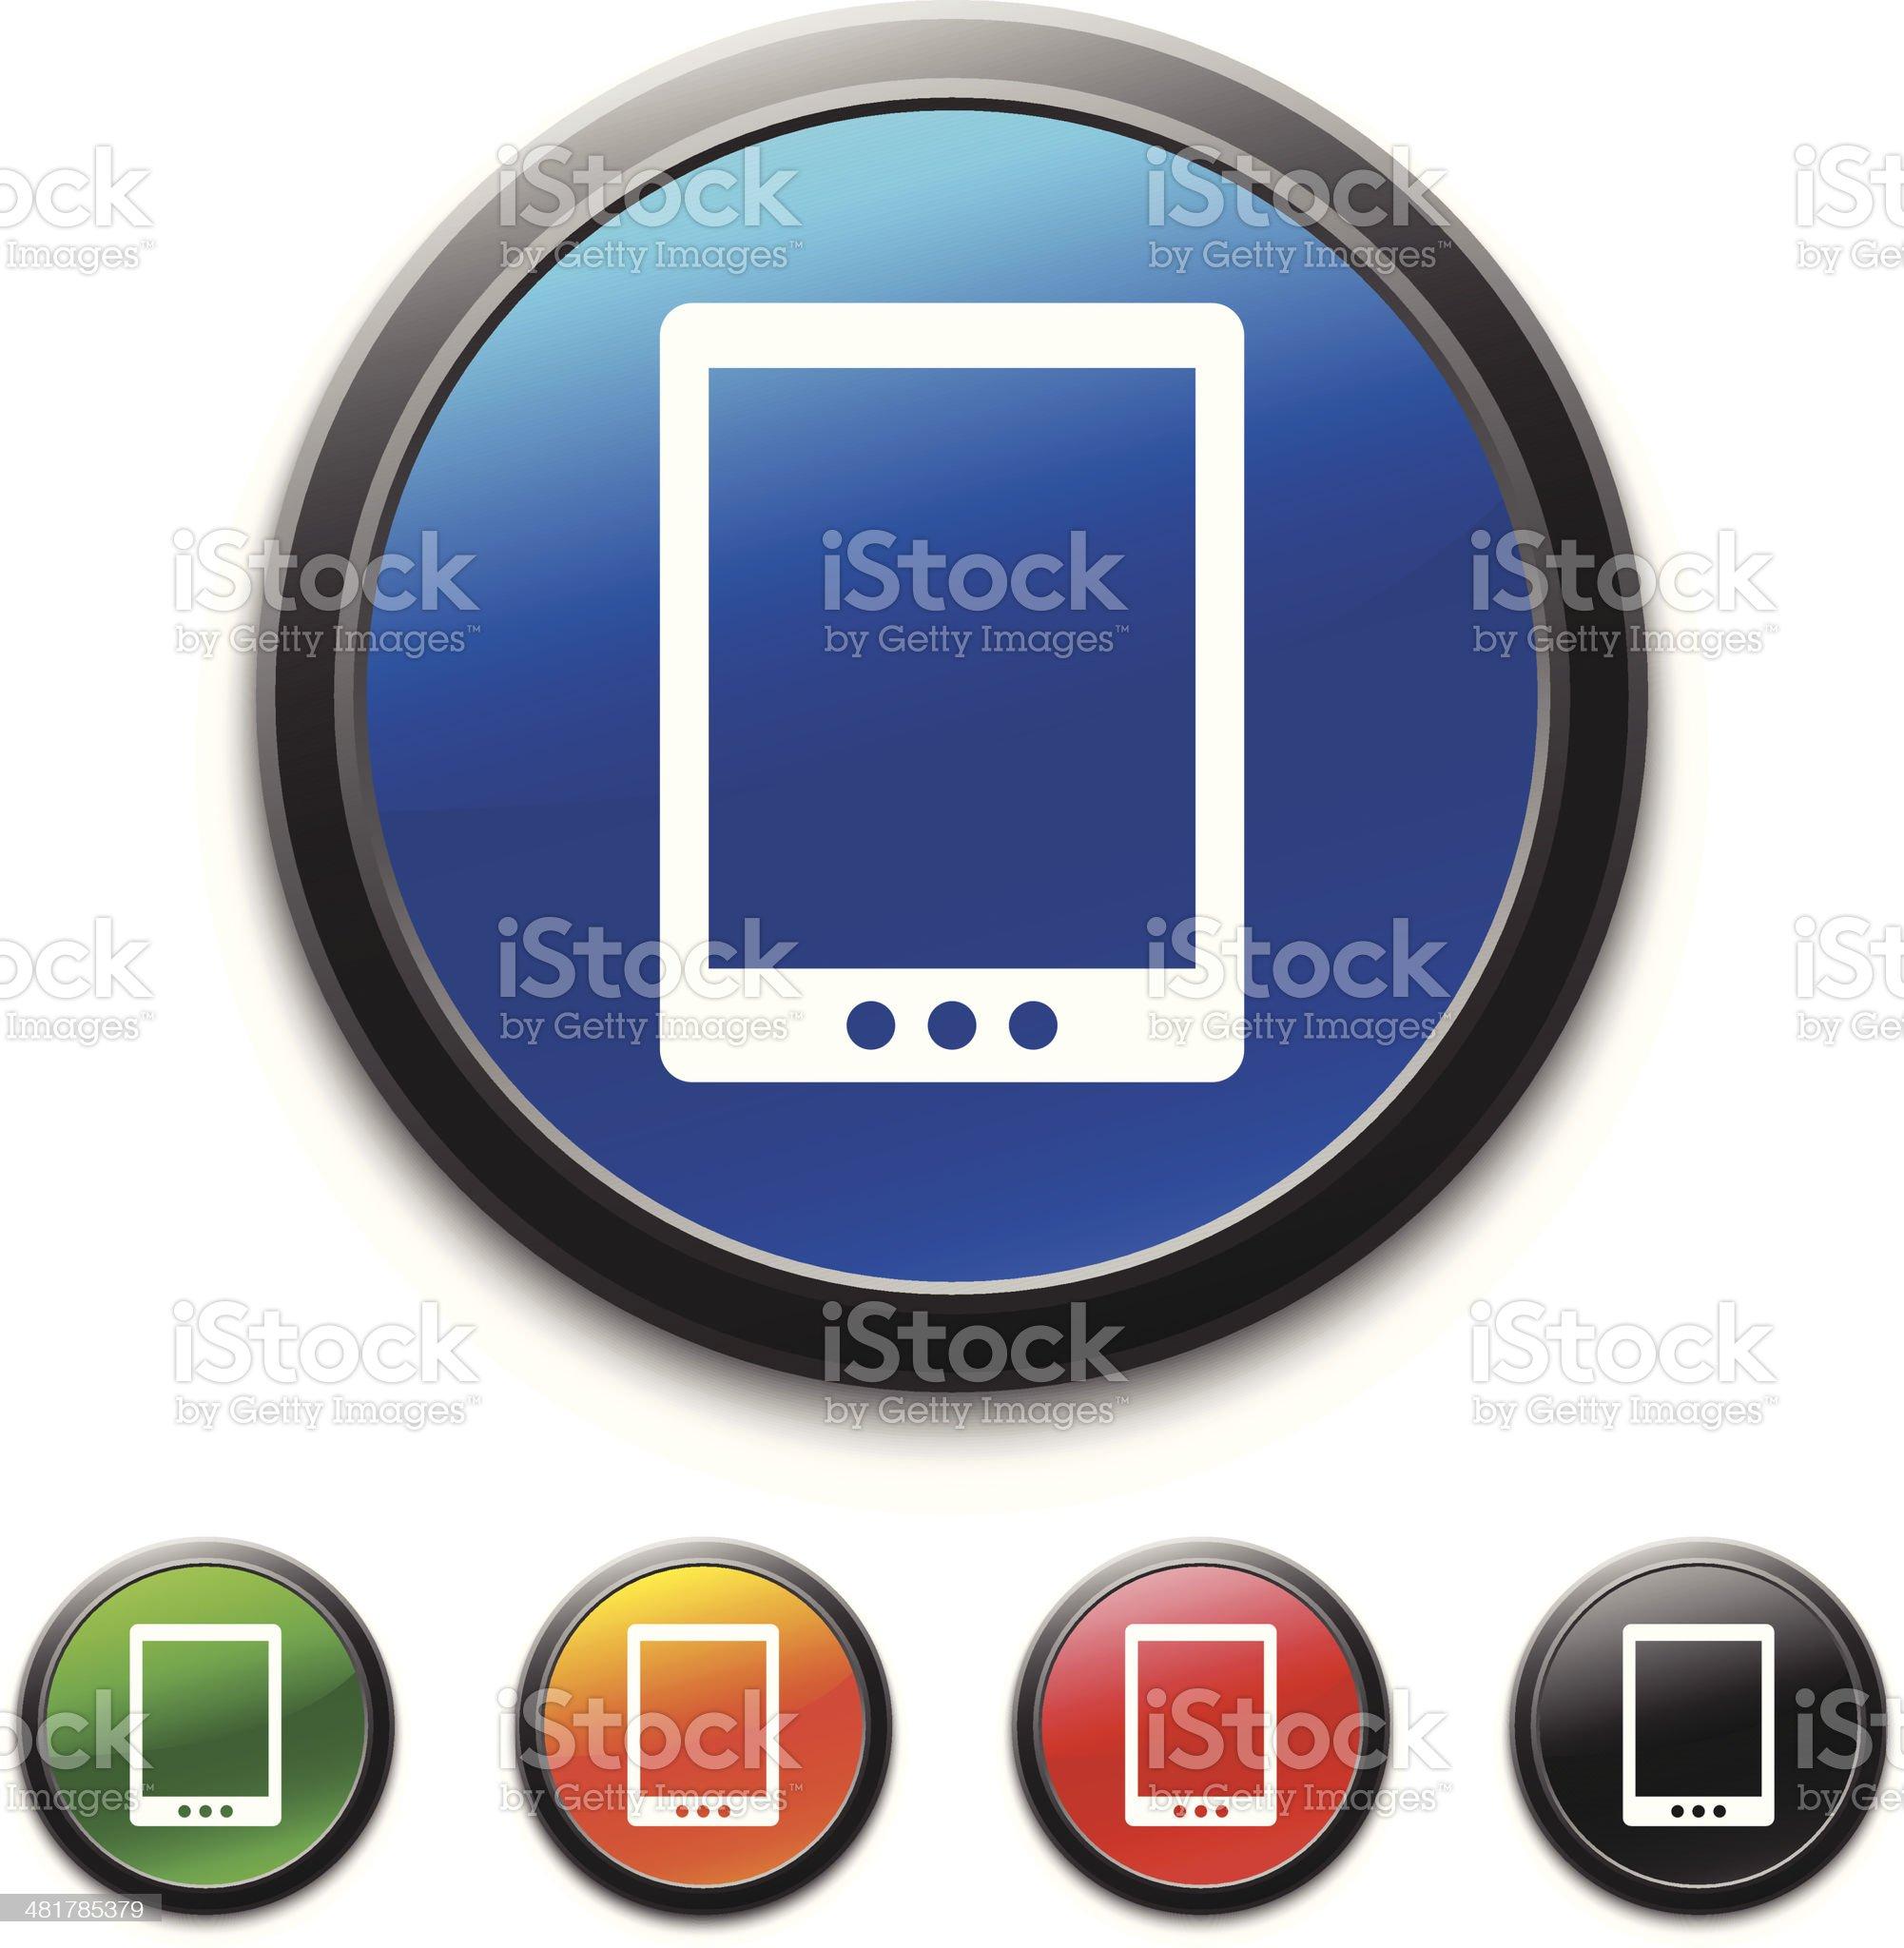 Digital Tablet icon royalty-free stock vector art